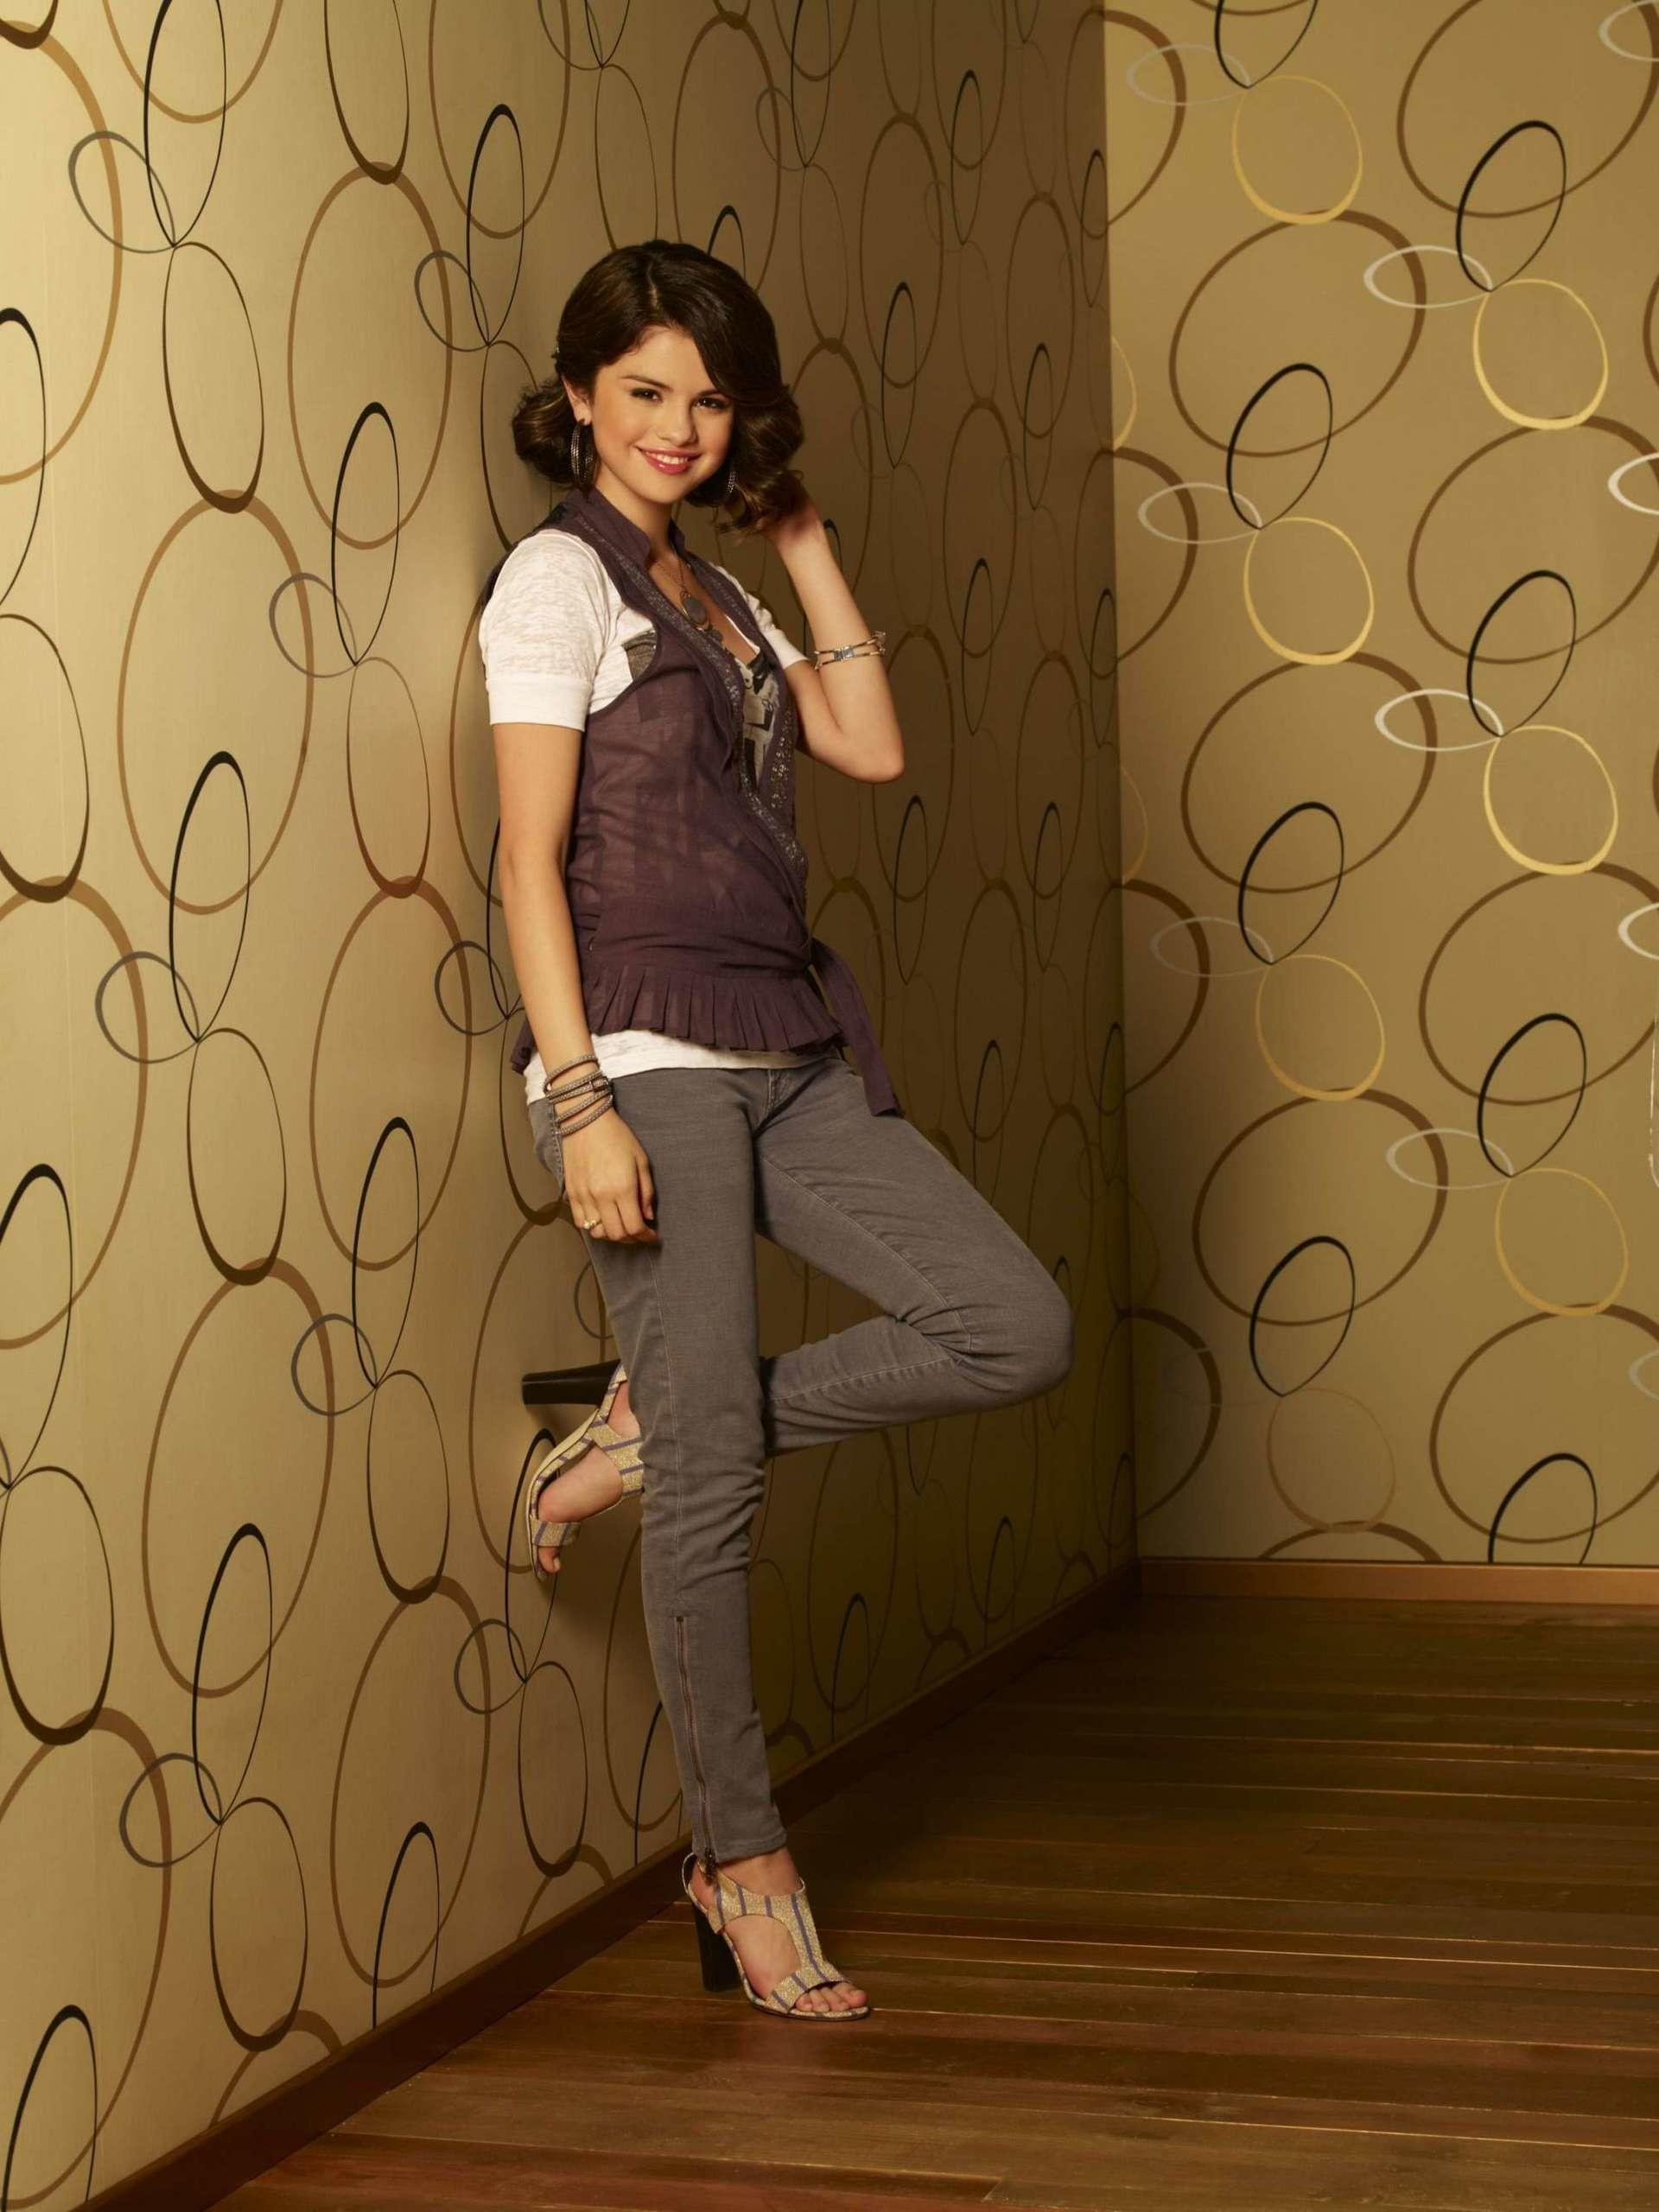 Selena photo. Selena Gomez